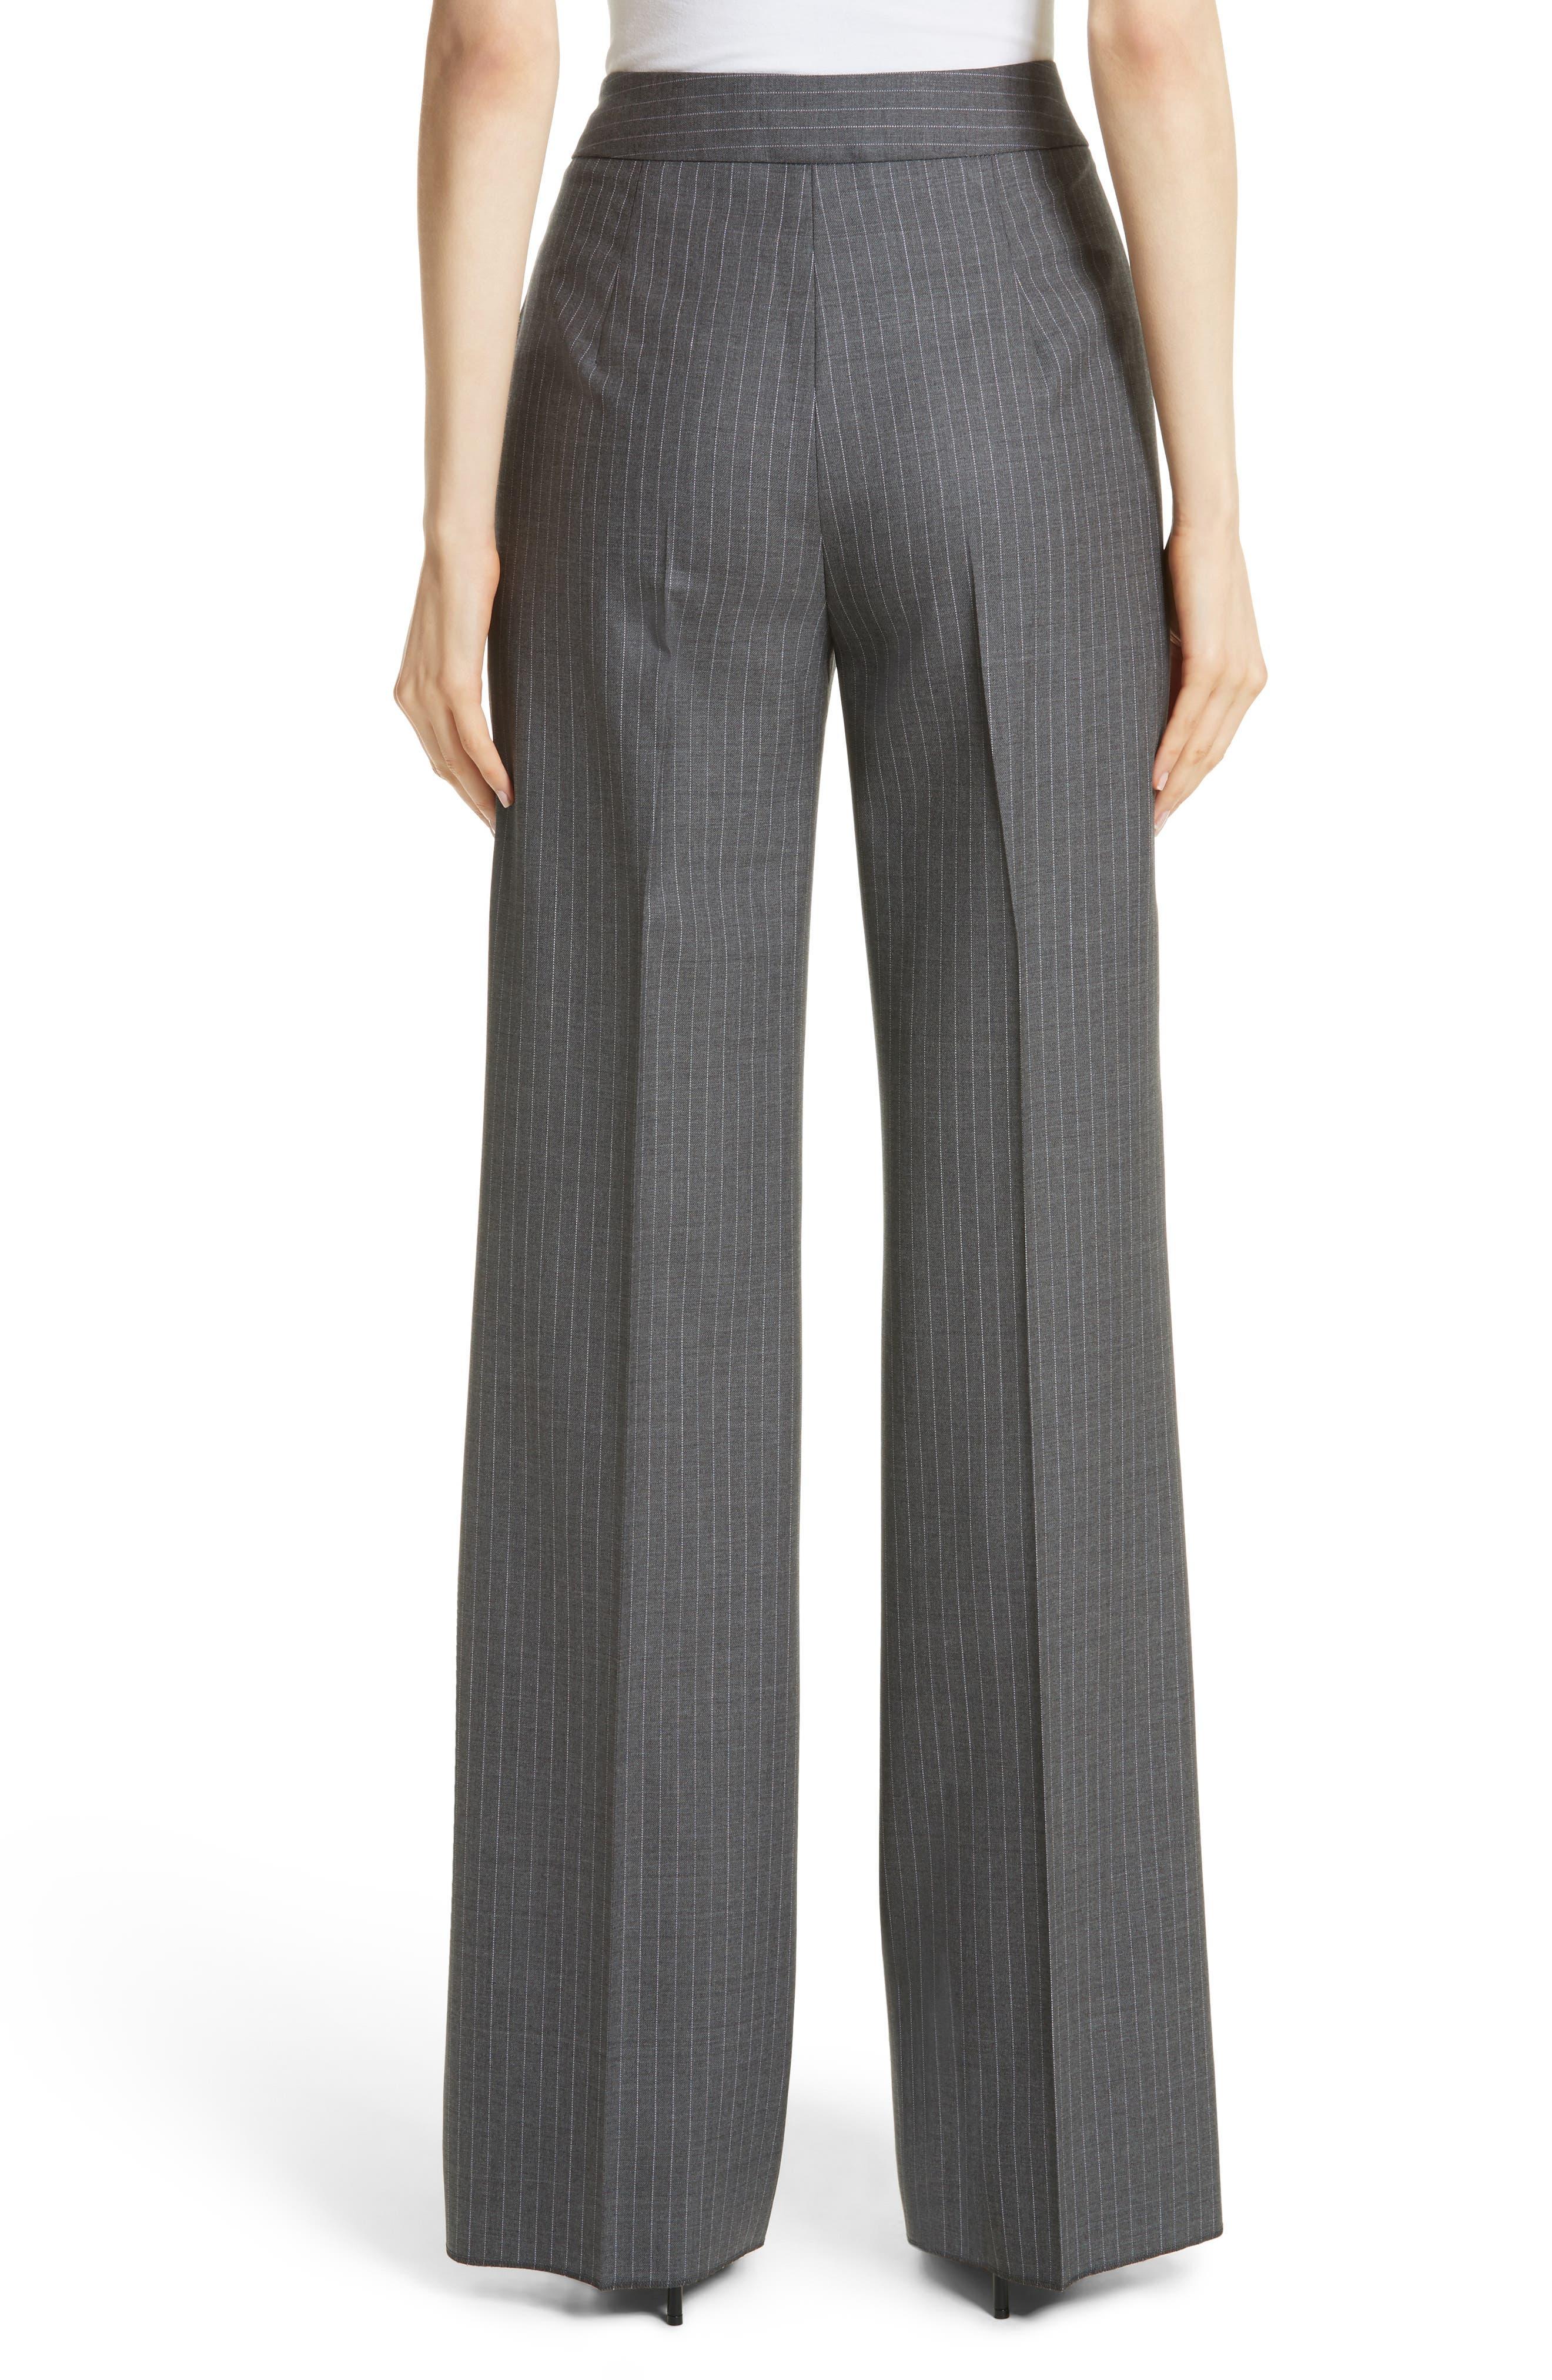 Garibo Stretch Wool Pinstripe Pants,                             Alternate thumbnail 2, color,                             034